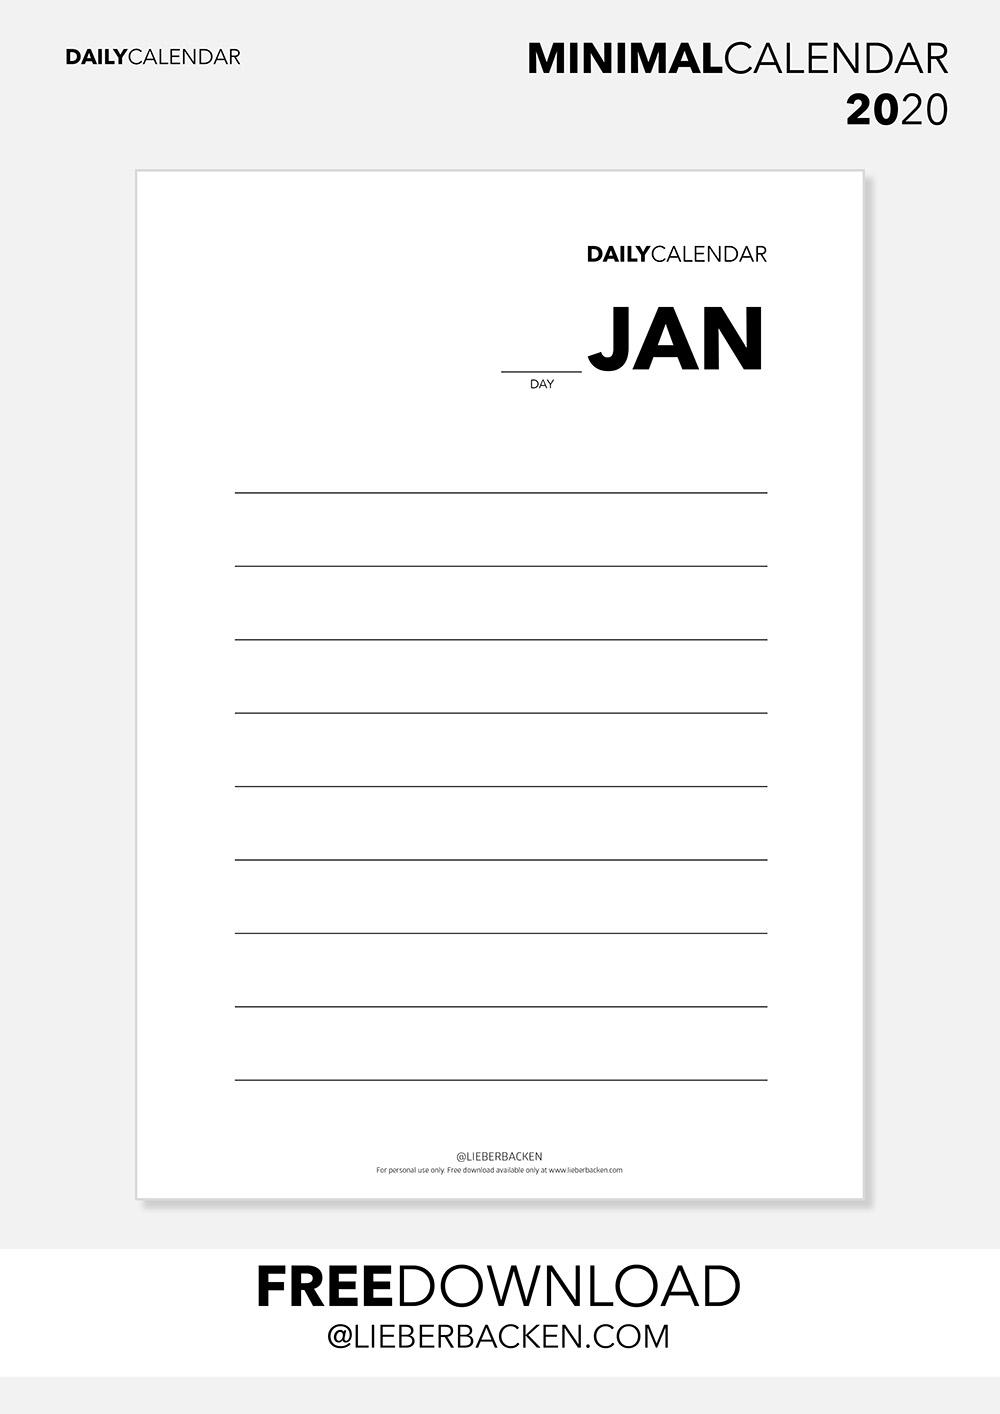 Daily Calender - Free Printable Calender 2020 Bundle | Gratis Download Kalender 2020